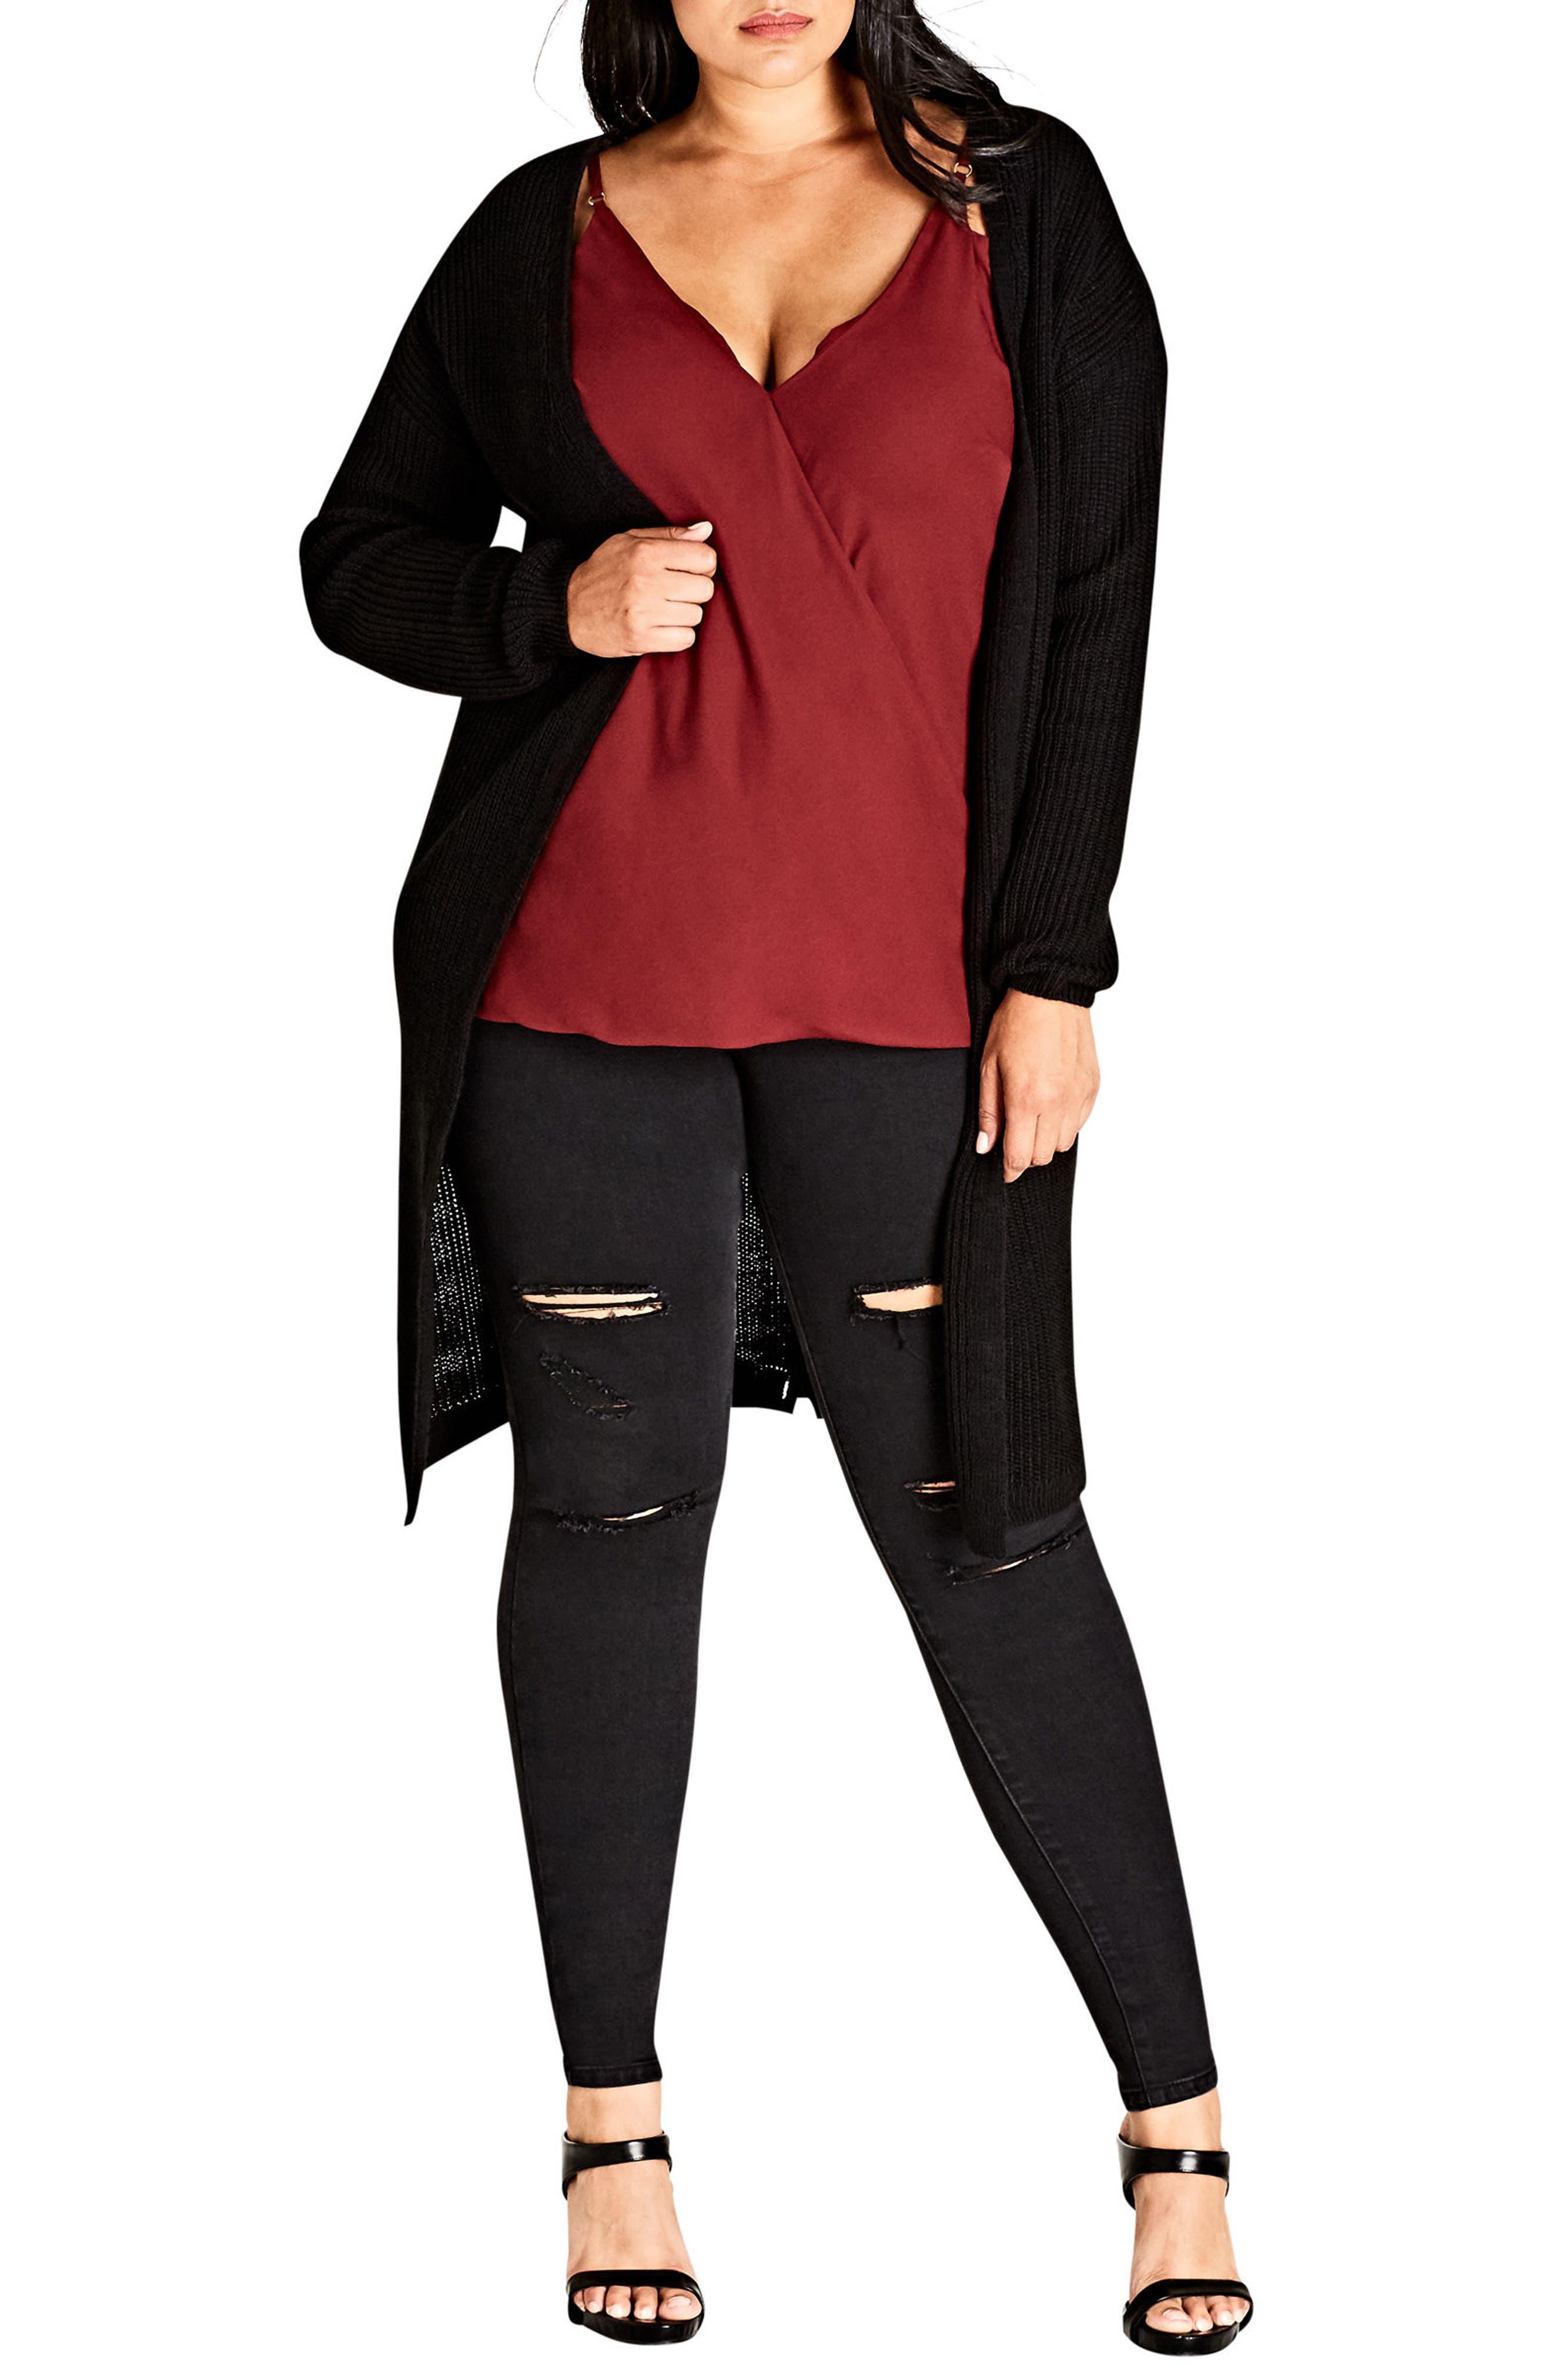 Main Image - City Chic Braid Back Cardigan (Plus Size)